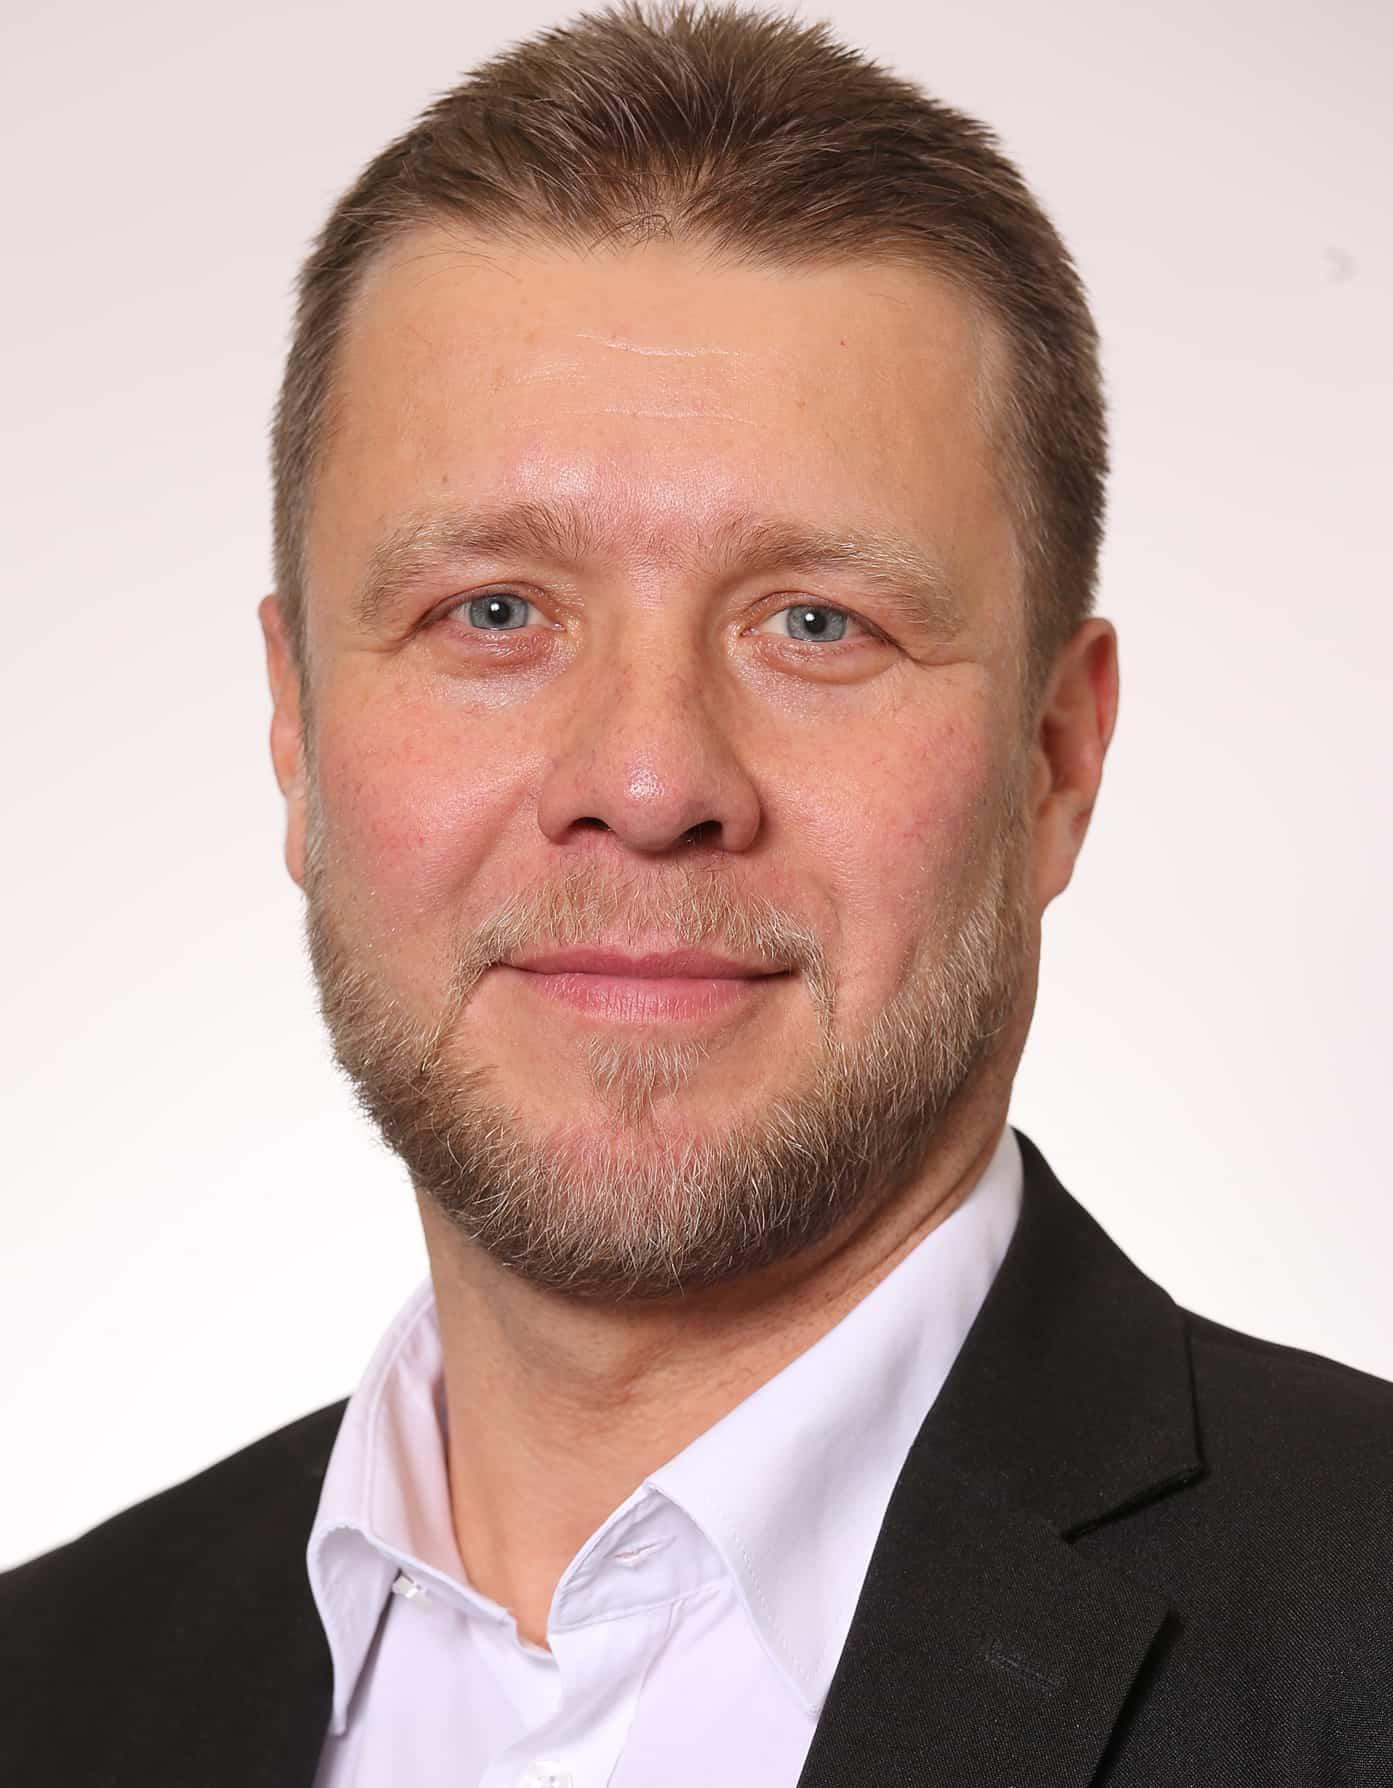 FriedrichVeis Kopf